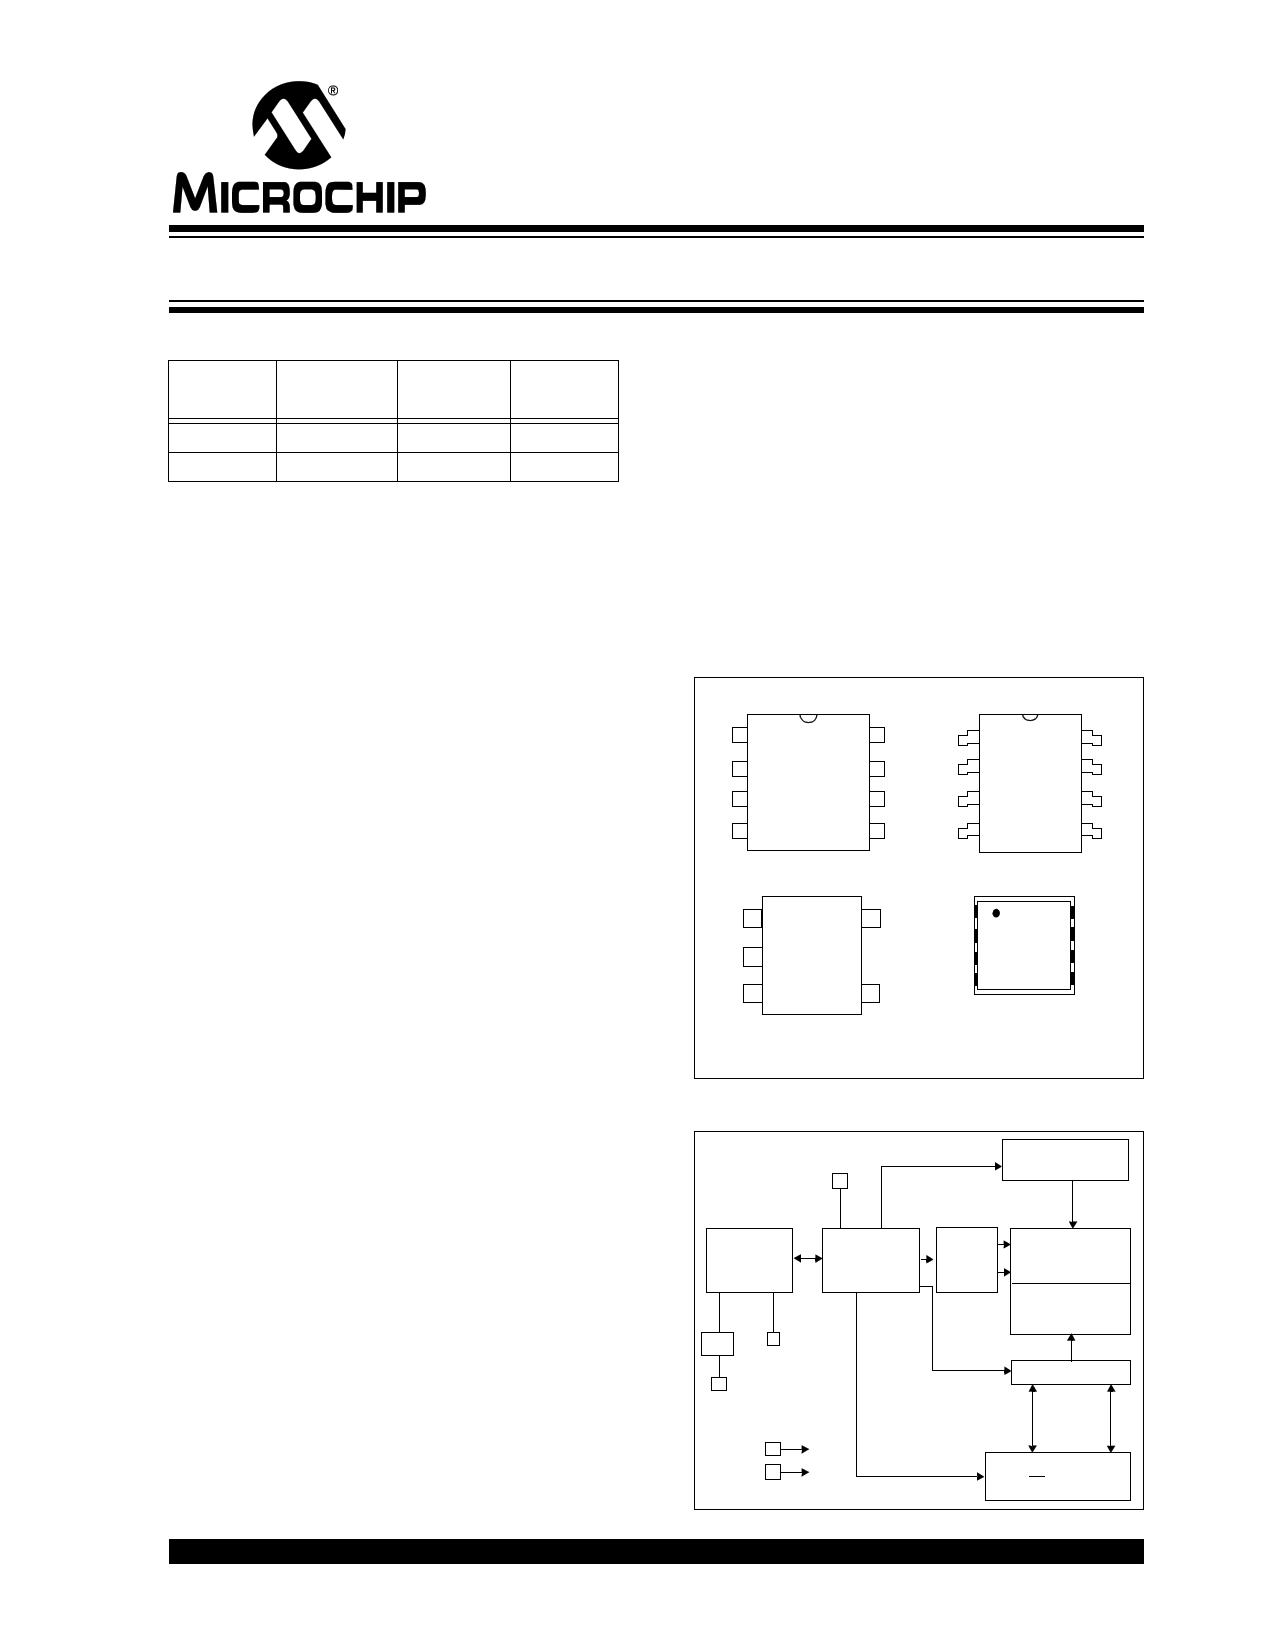 24AA02 datasheet, circuit